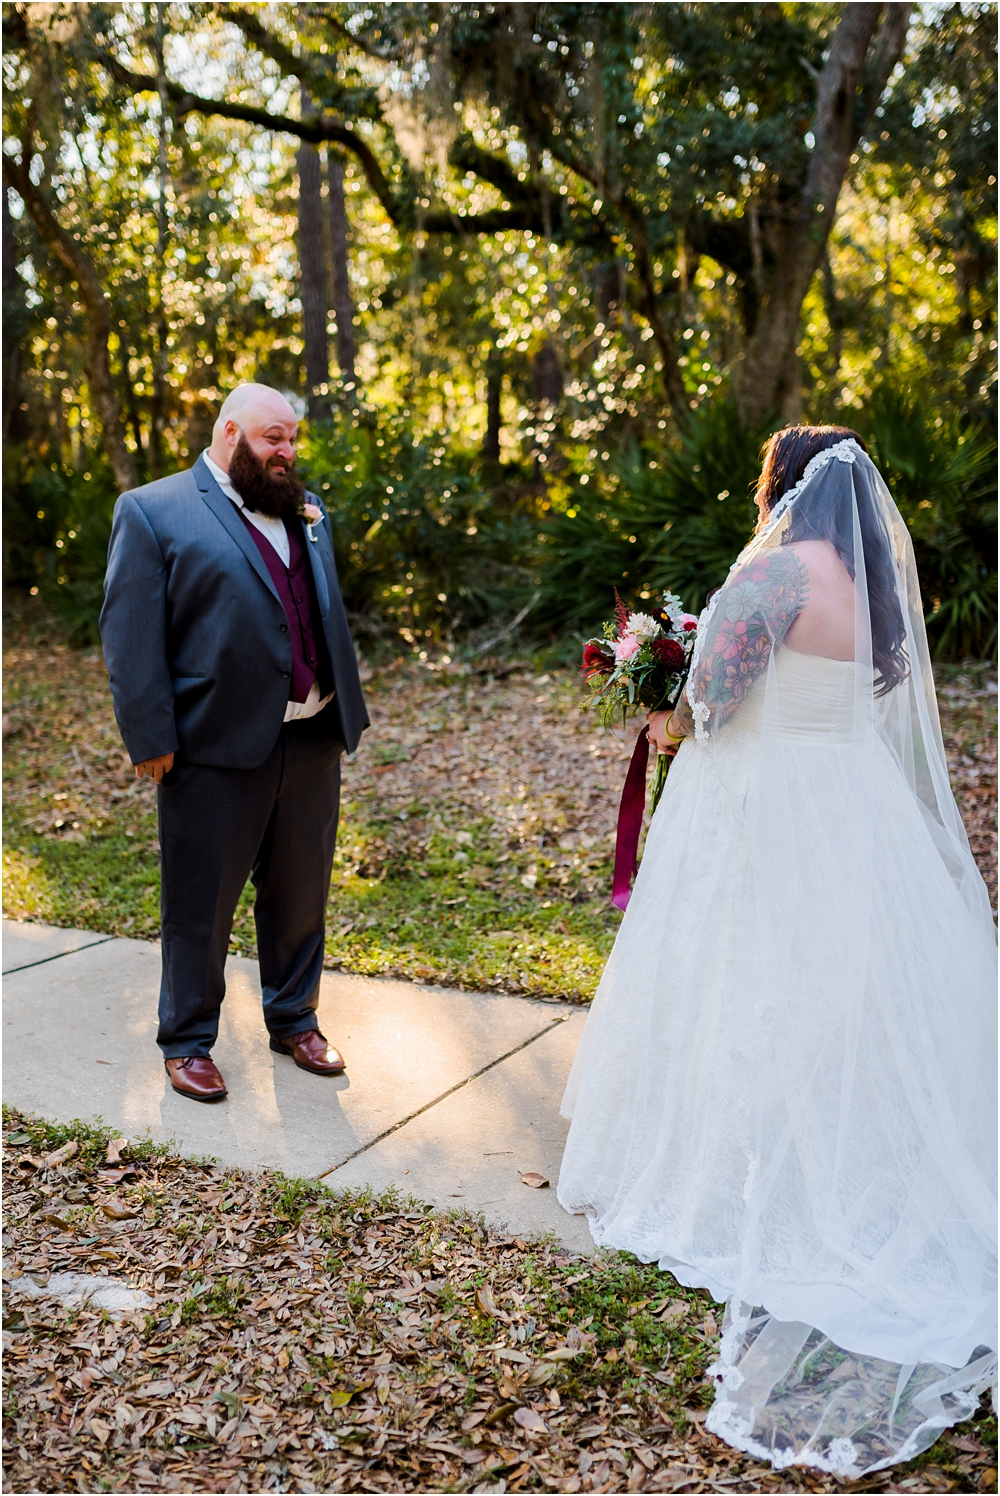 Eden-Gardens-florida-wedding-photographer-kiersten-stevenson-photography-32.jpg